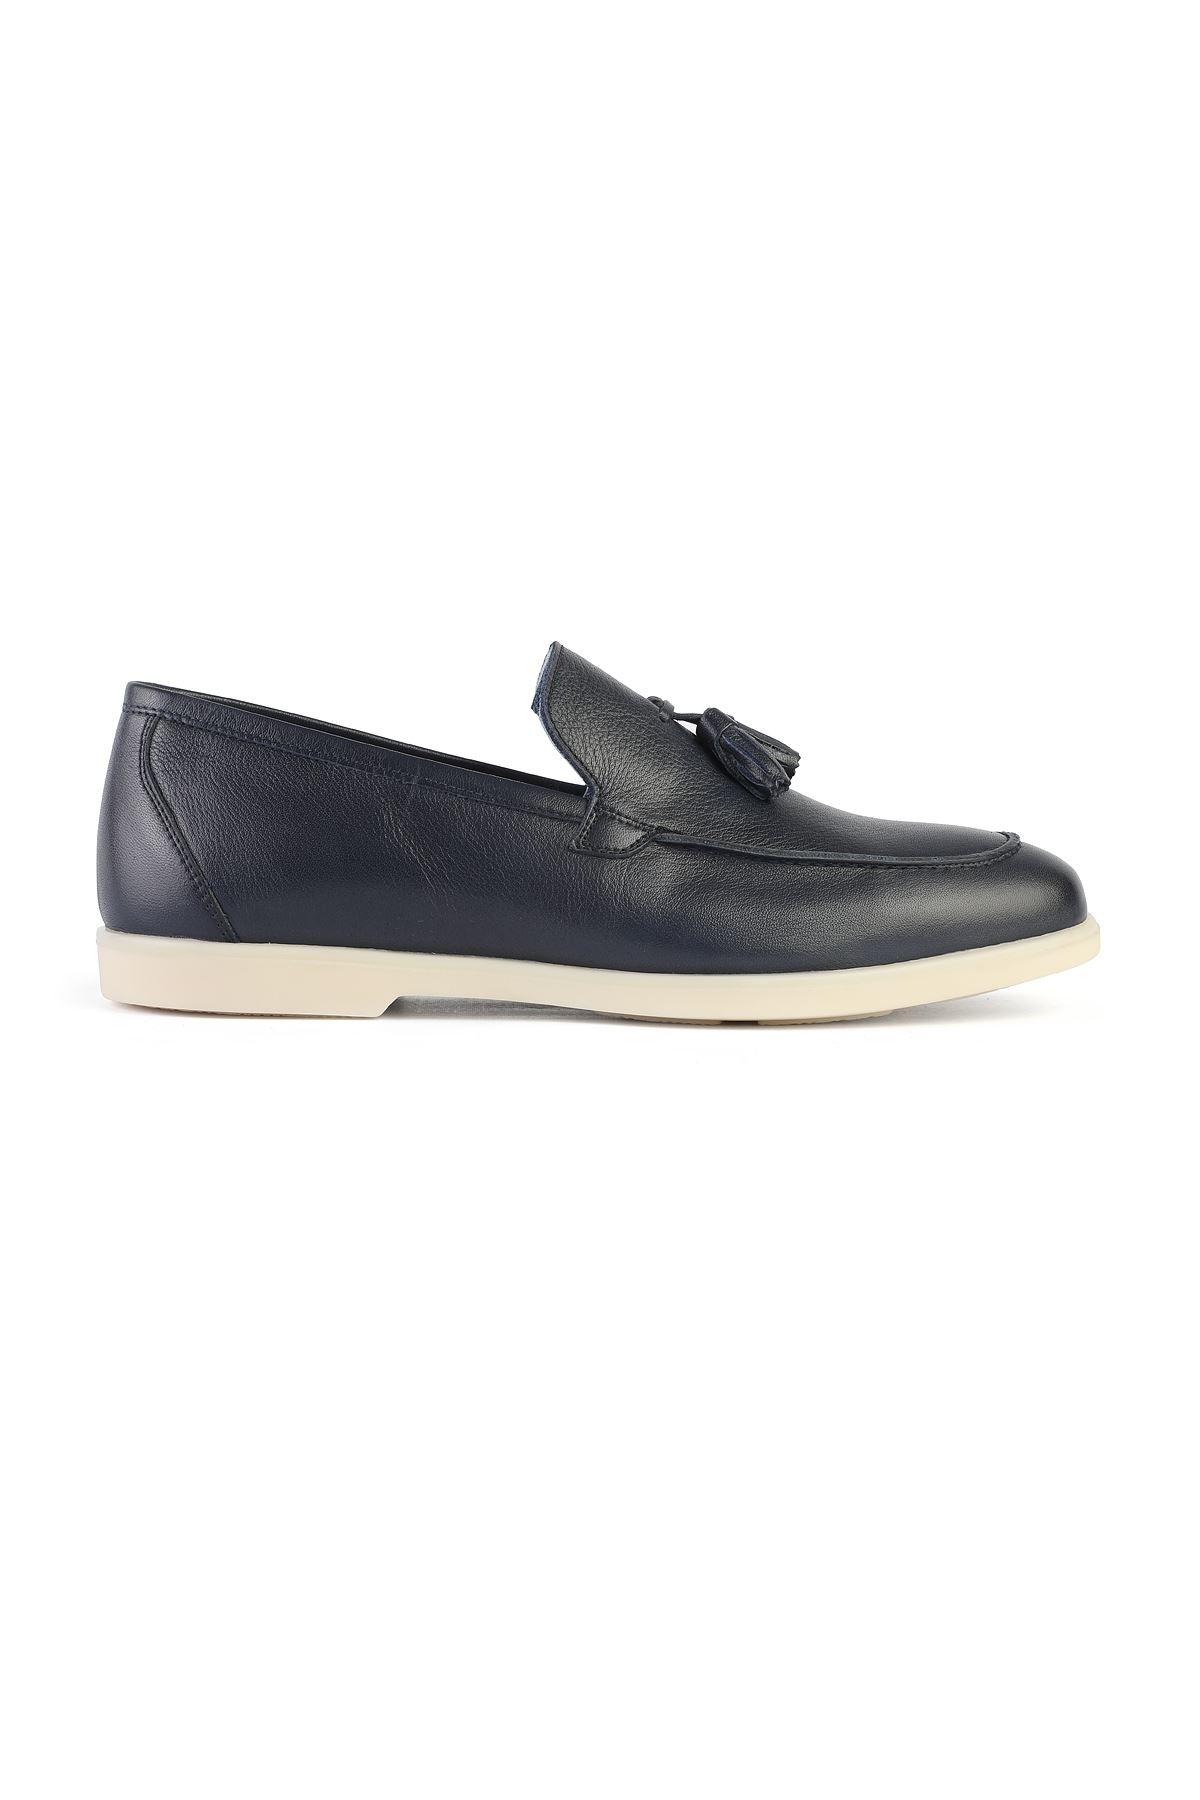 Libero 3219 Lacivert Loafer Ayakkabı